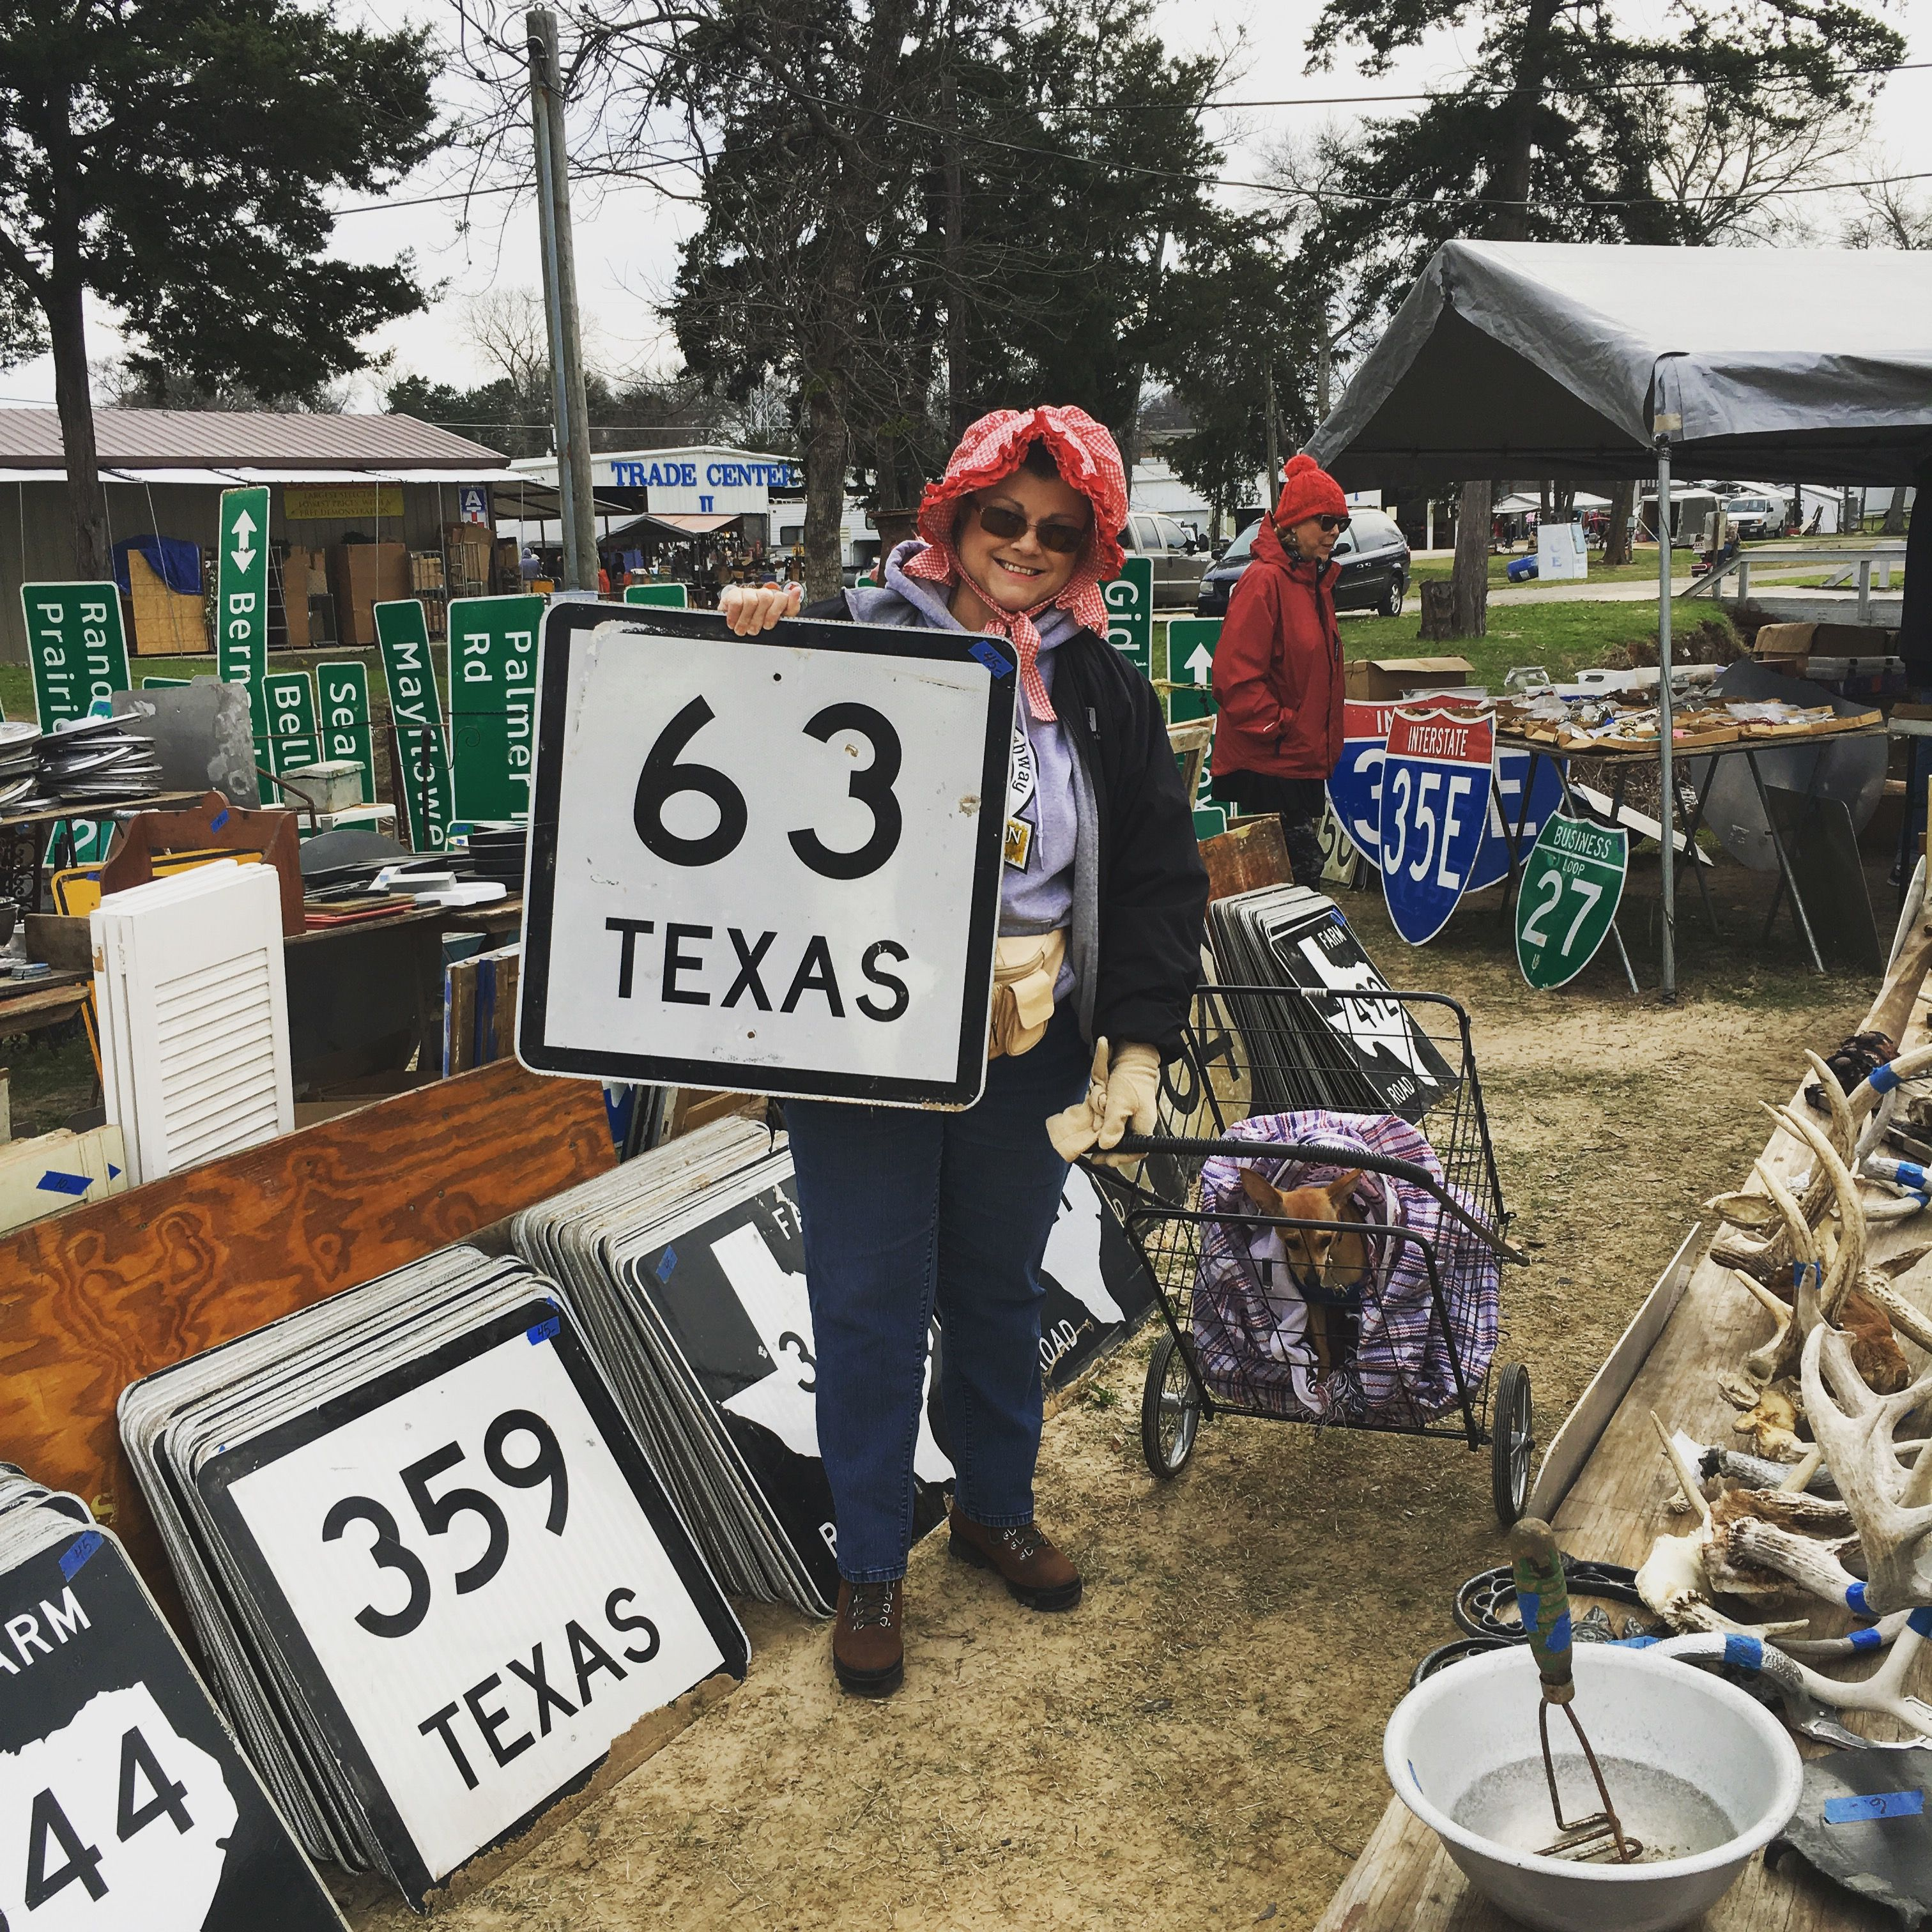 Firstmondaytradedays Vanzandtcounty Dealers Highwaysigns Vintage Cantontexas Blingblinkyoftexas Canton Texas Van Zandt County Lone Star State